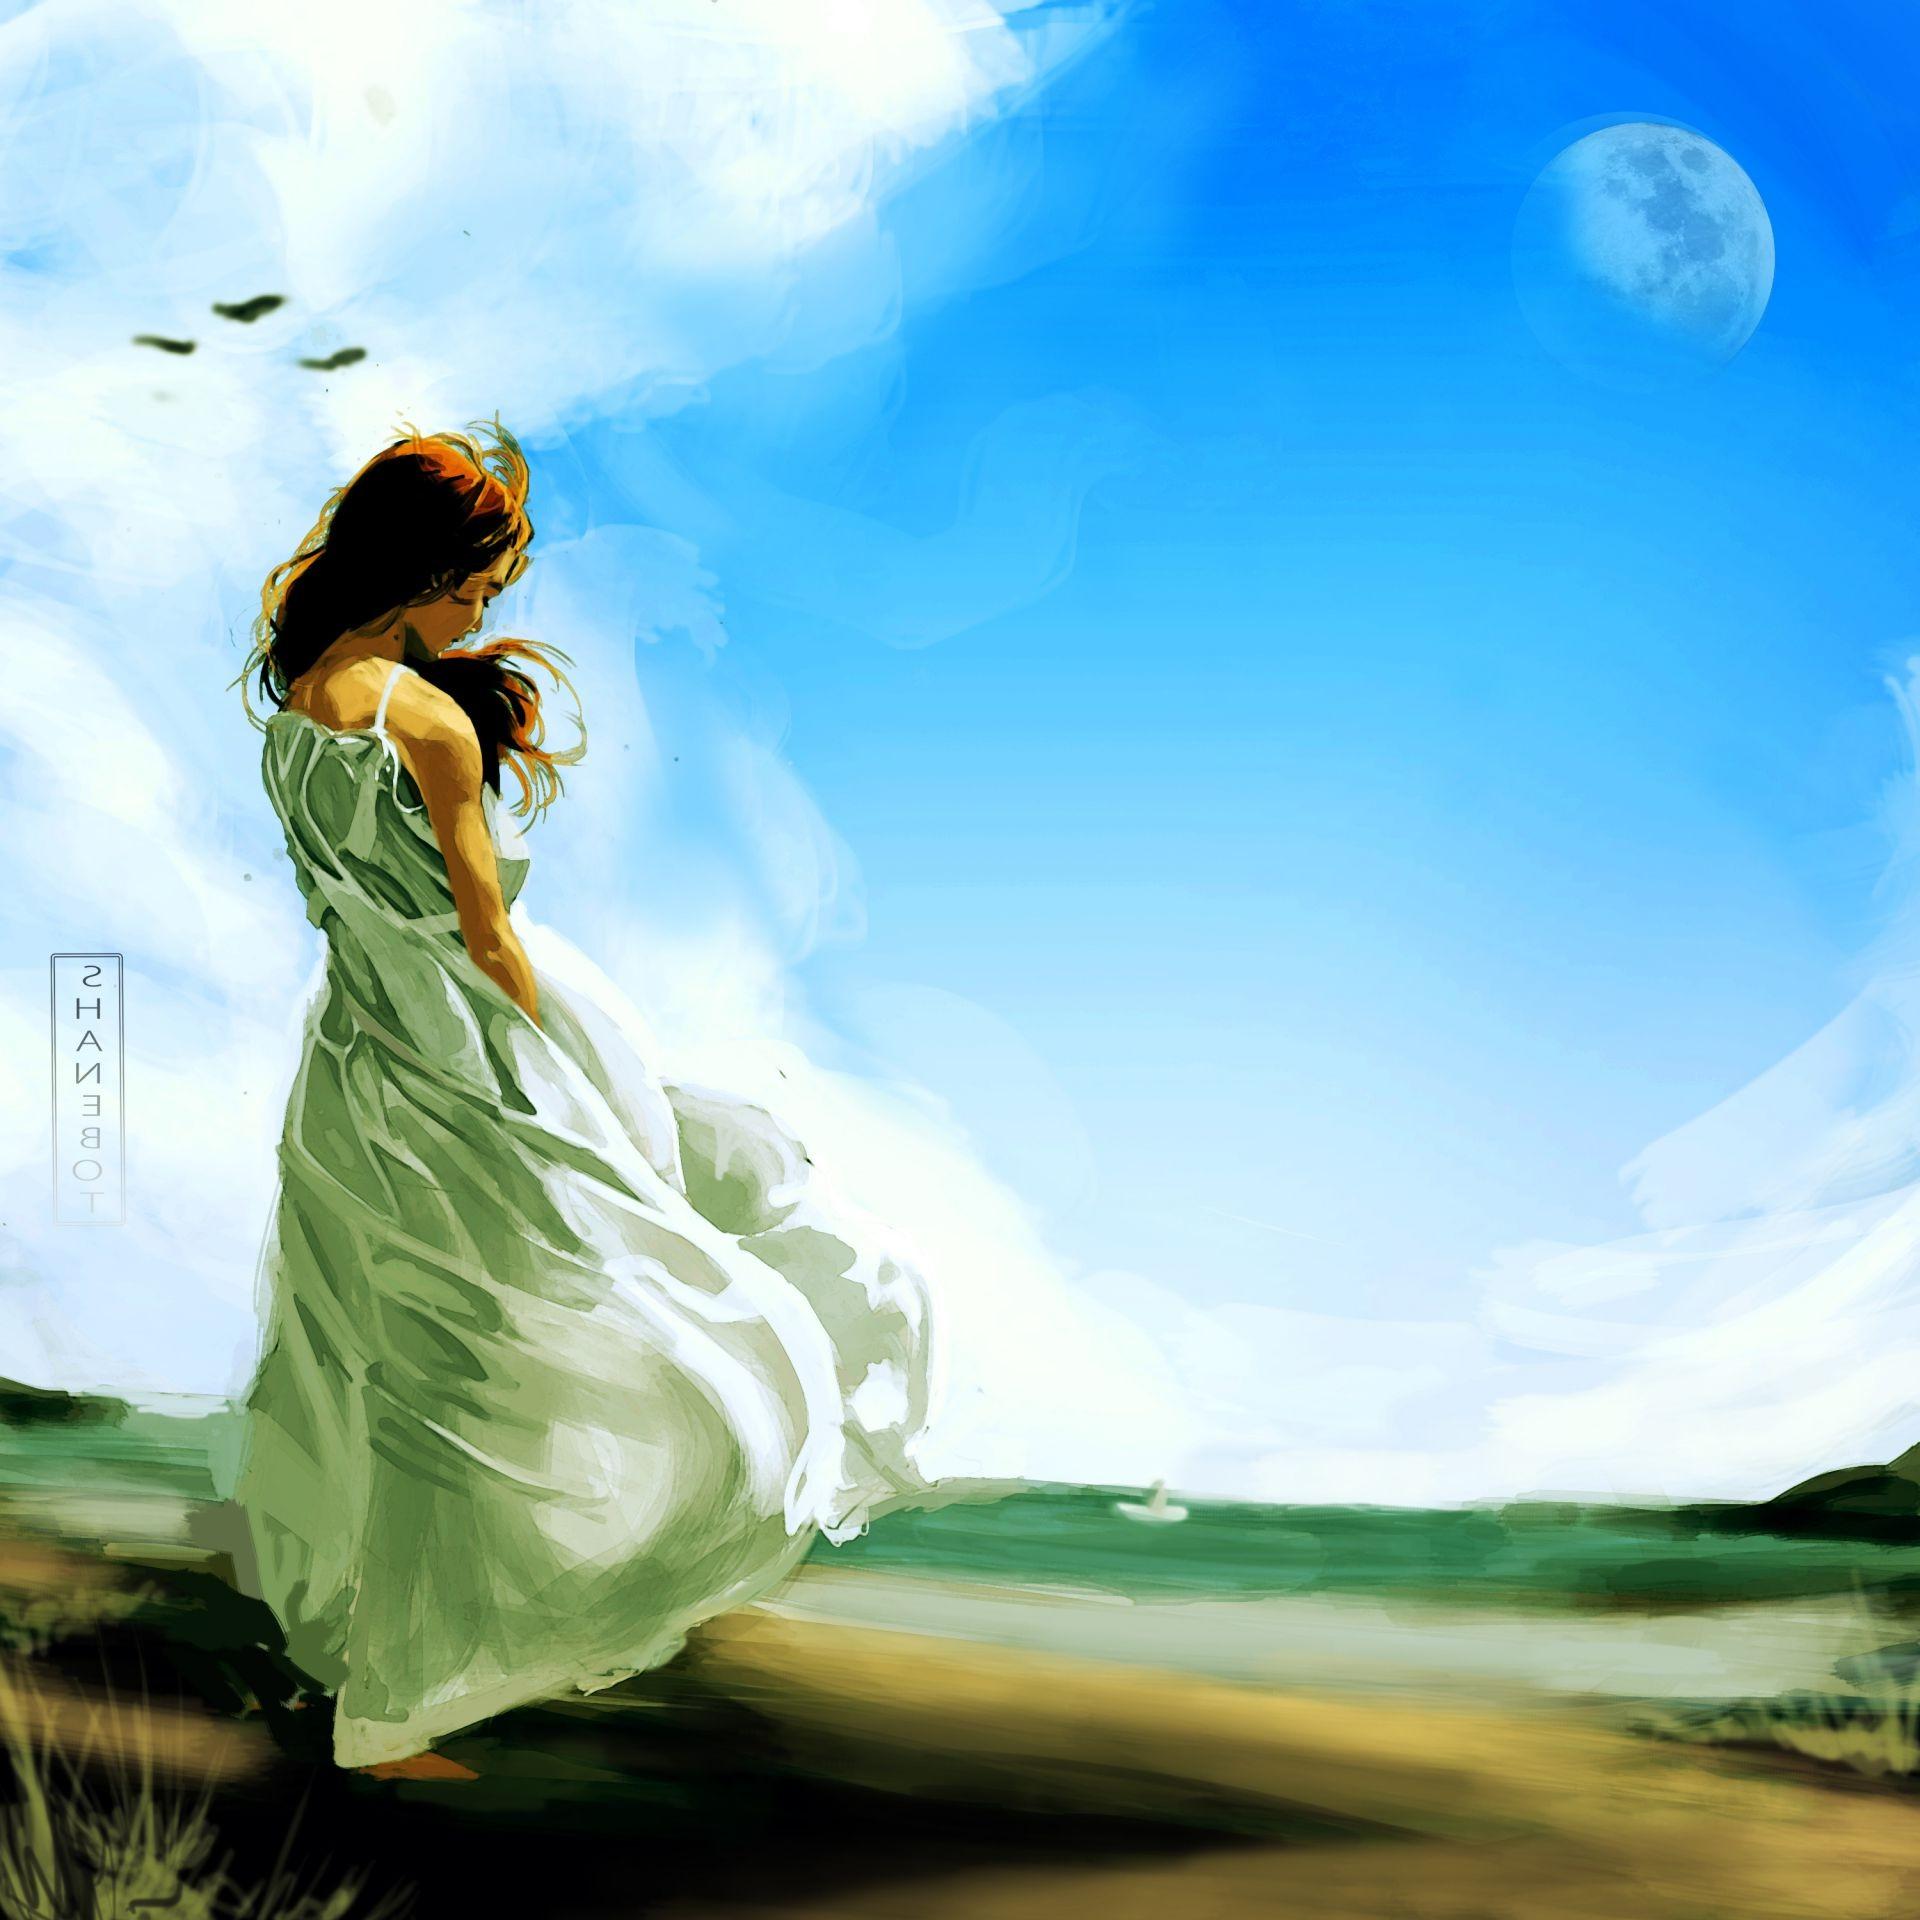 Beautiful Nature Girl Wallpaper: Shanebot Girl Art Sky Clouds Moon Alone